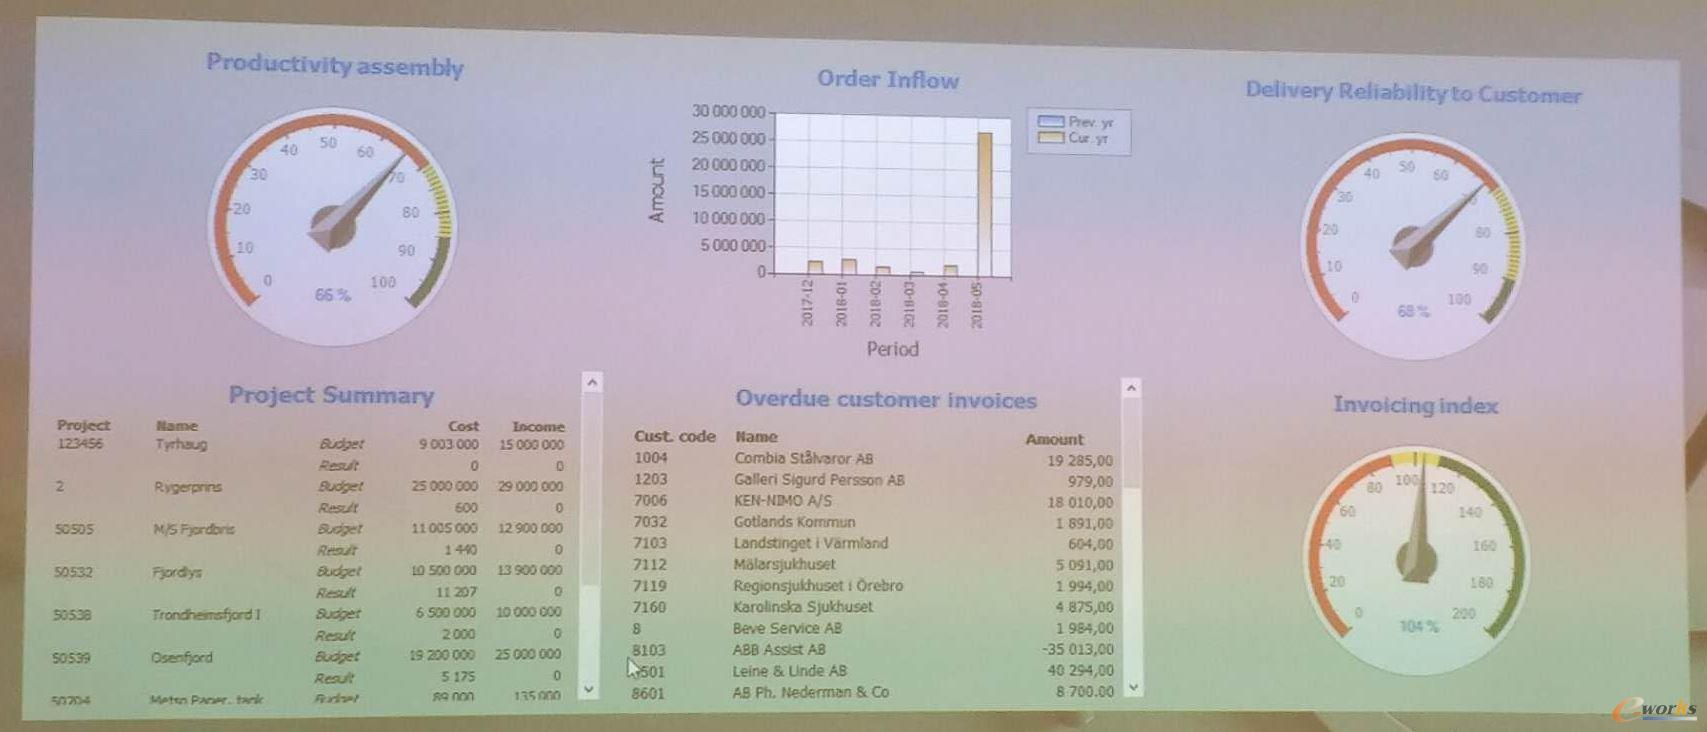 SUNFAB应用MonitorERP系统产生的仪表盘